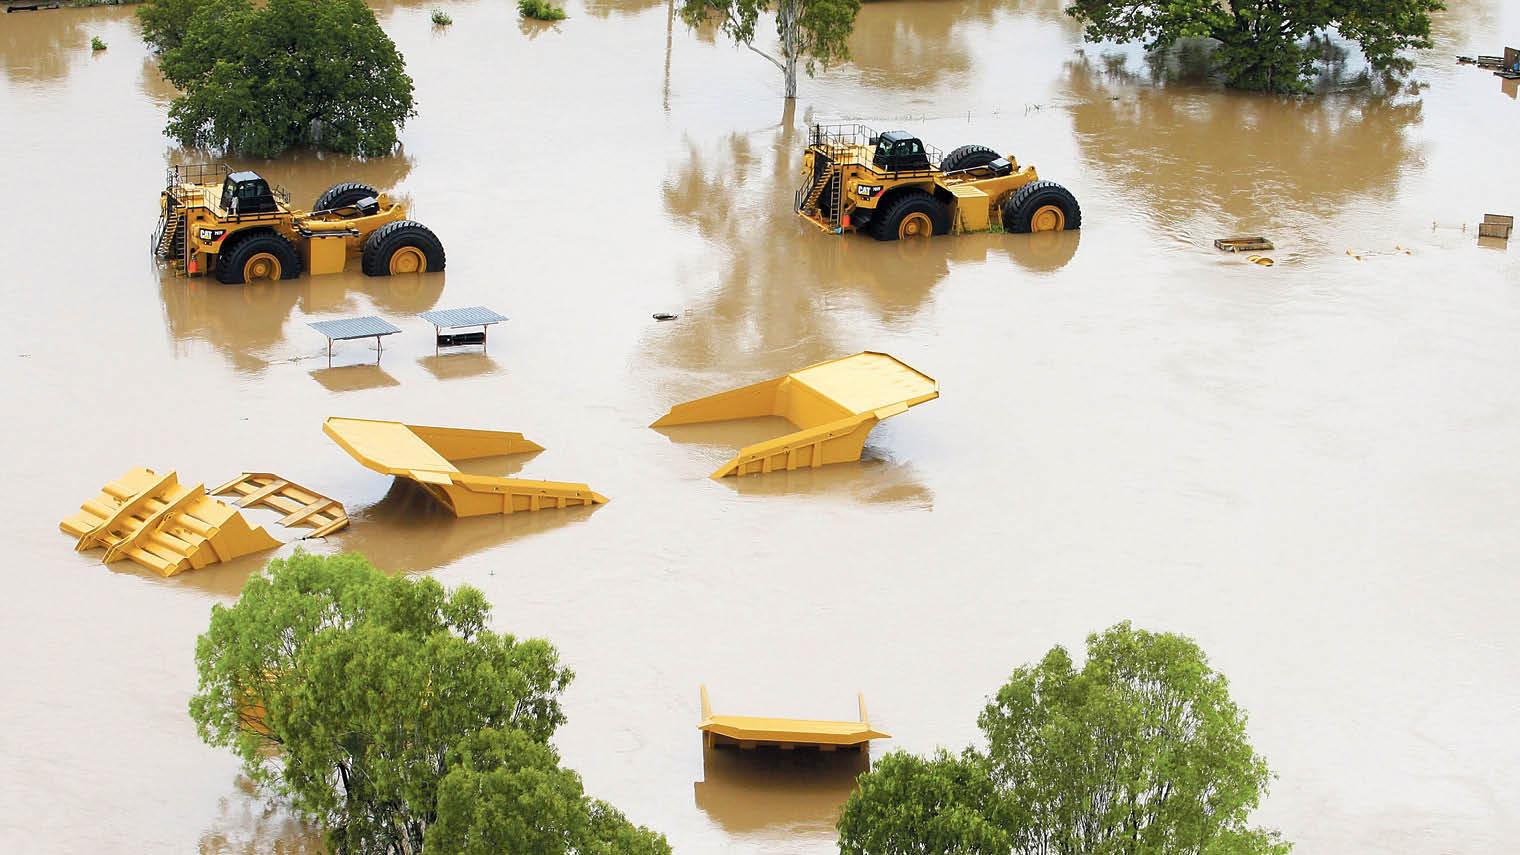 Submerged mining equipment under flood water in Rockhampton, Australia in 2011